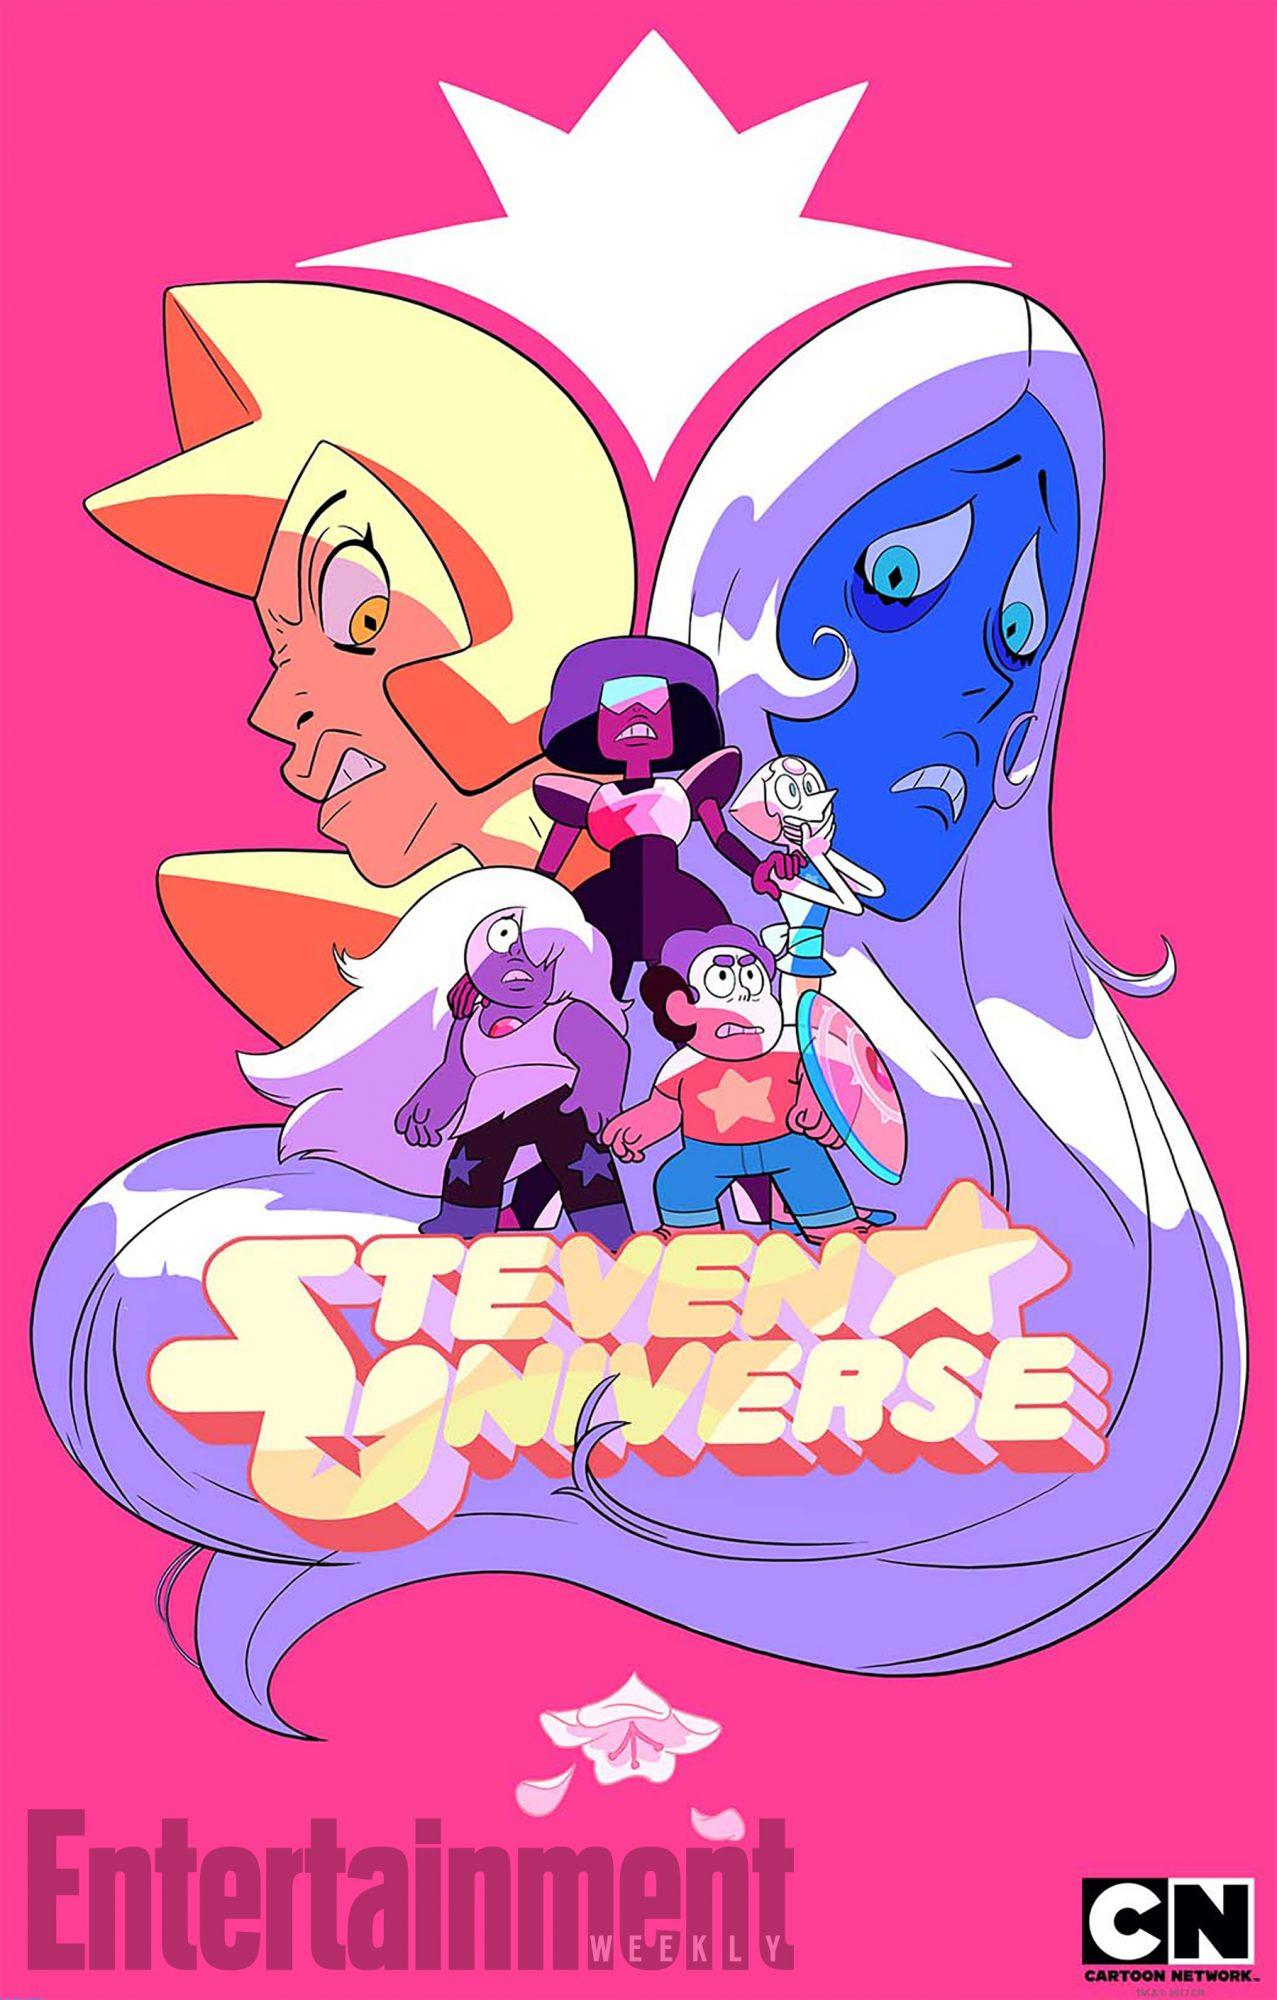 Cartoon Network Comic-Con exclusives